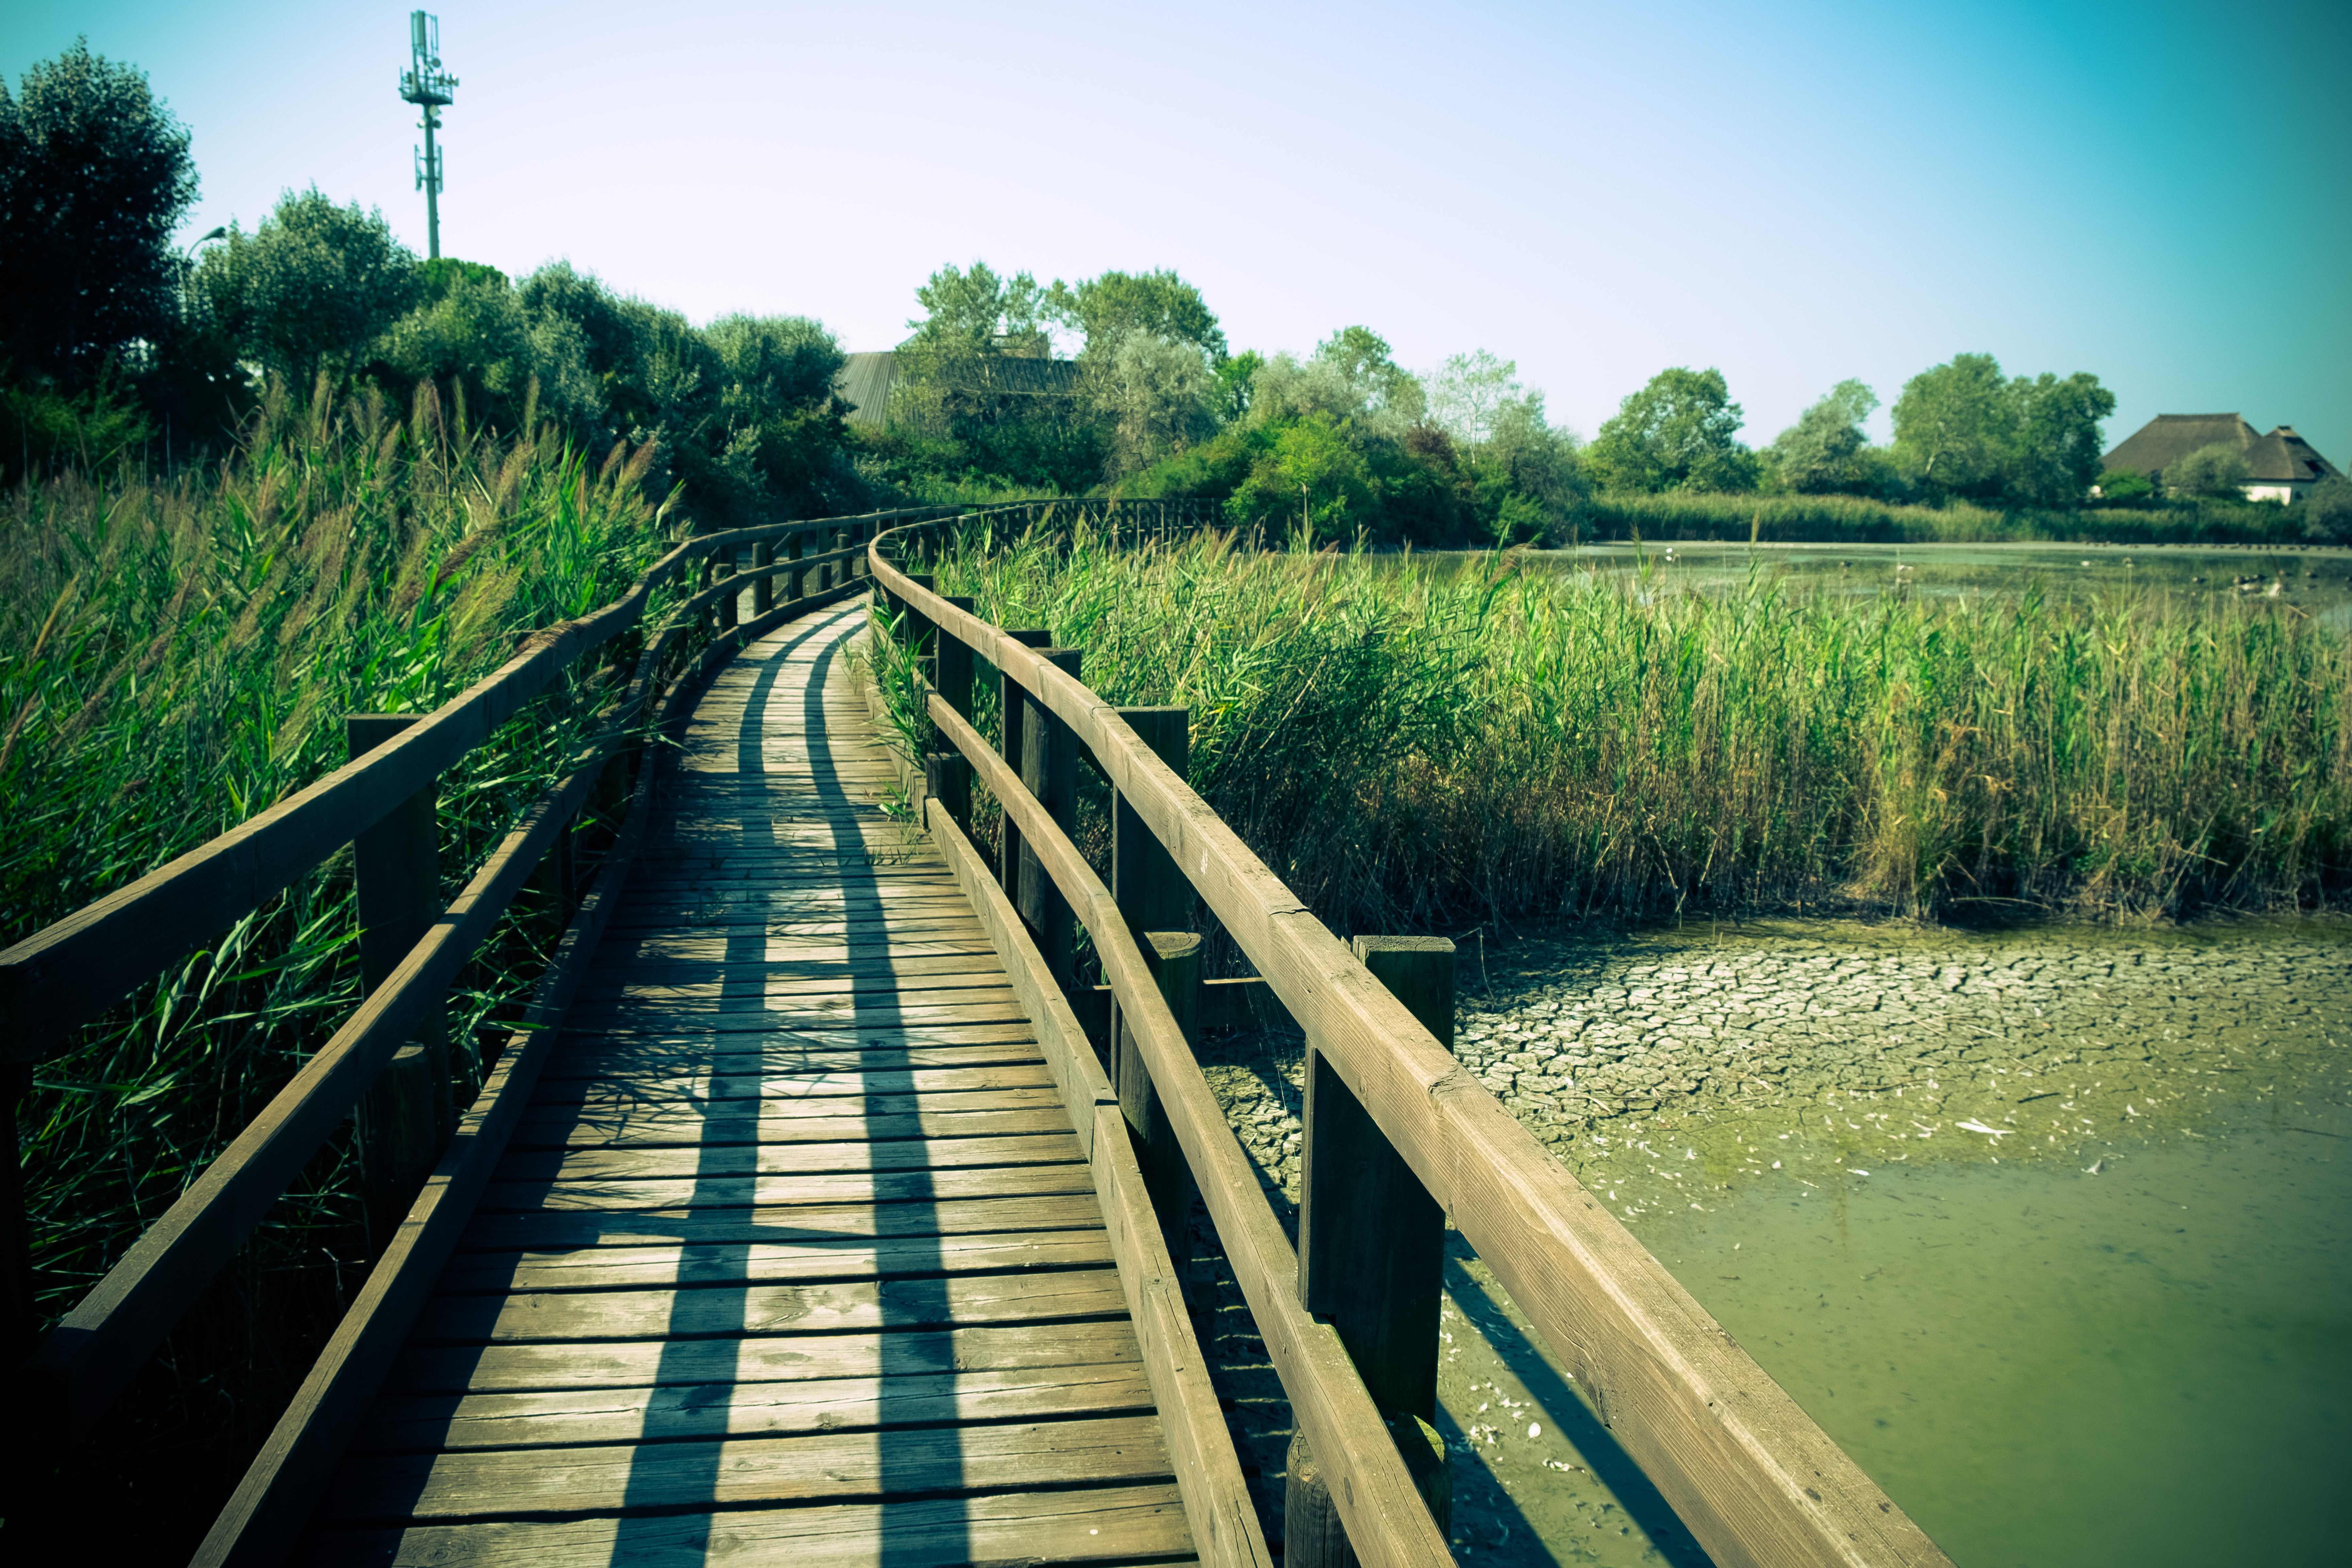 Brown wooden bridge, italy, marano lagunare HD wallpaper   Wallpaper ...